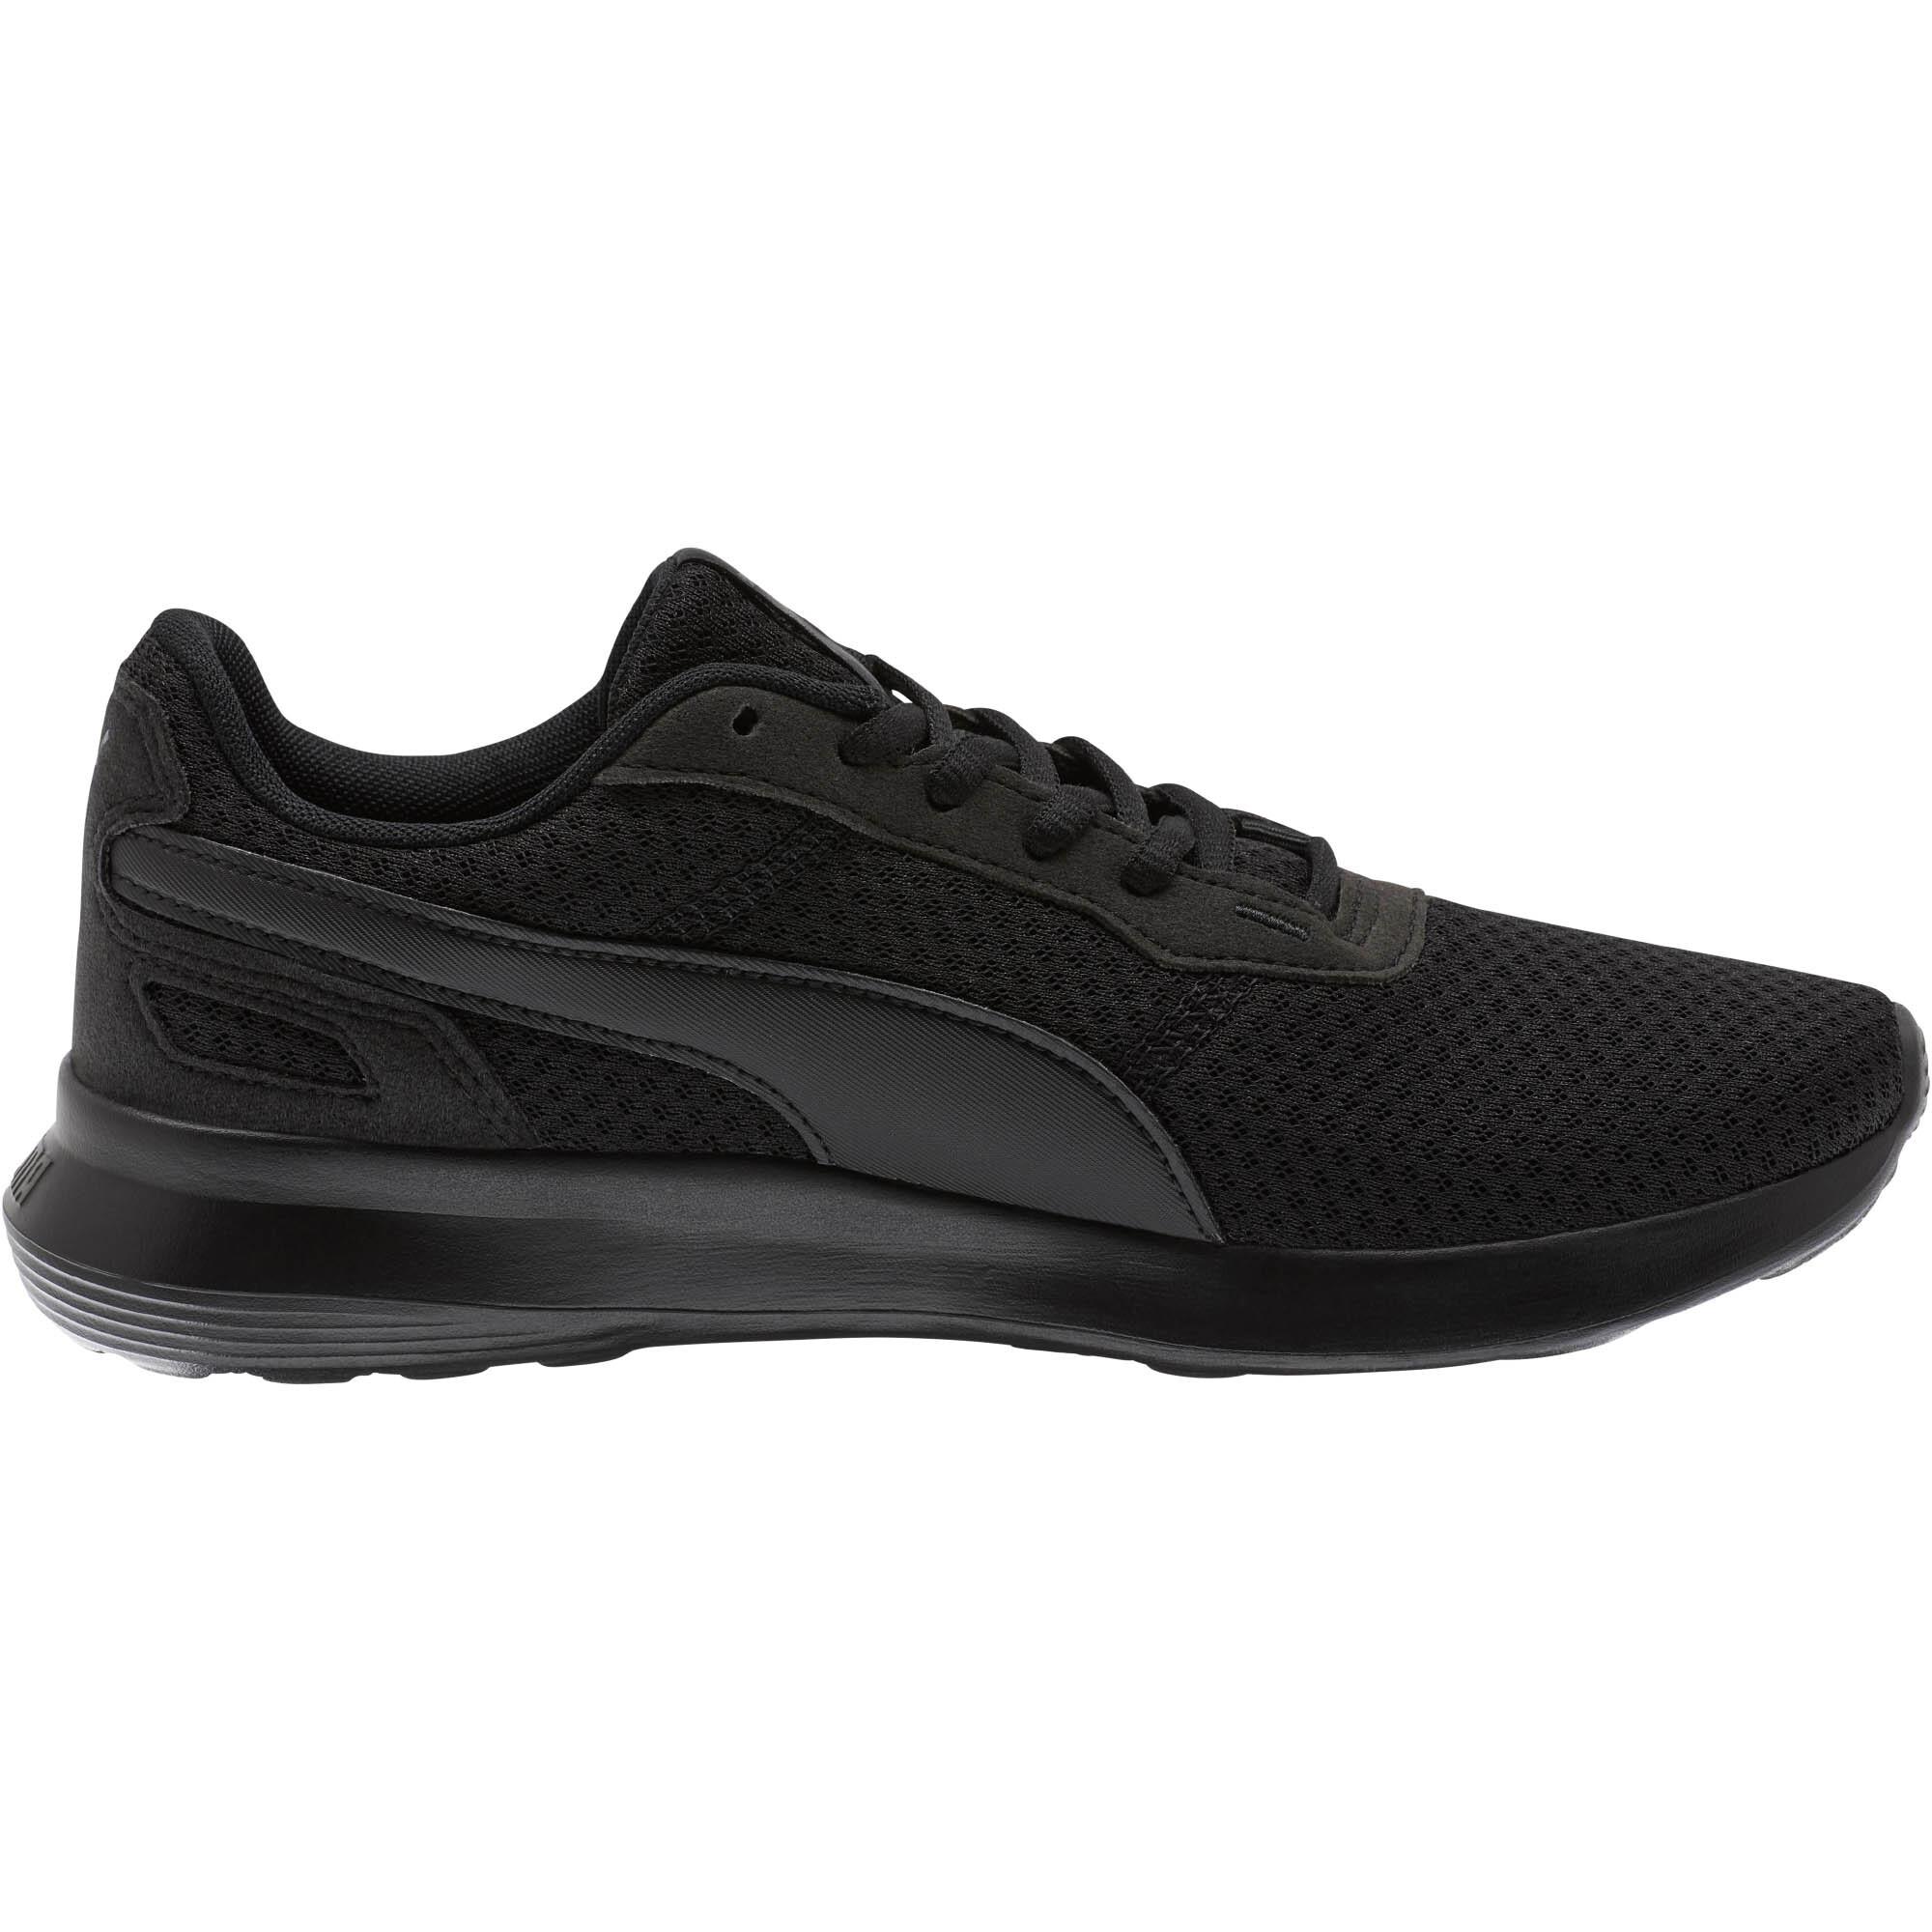 PUMA-ST-Activate-Women-s-Sneakers-Women-Shoe-Basics thumbnail 5